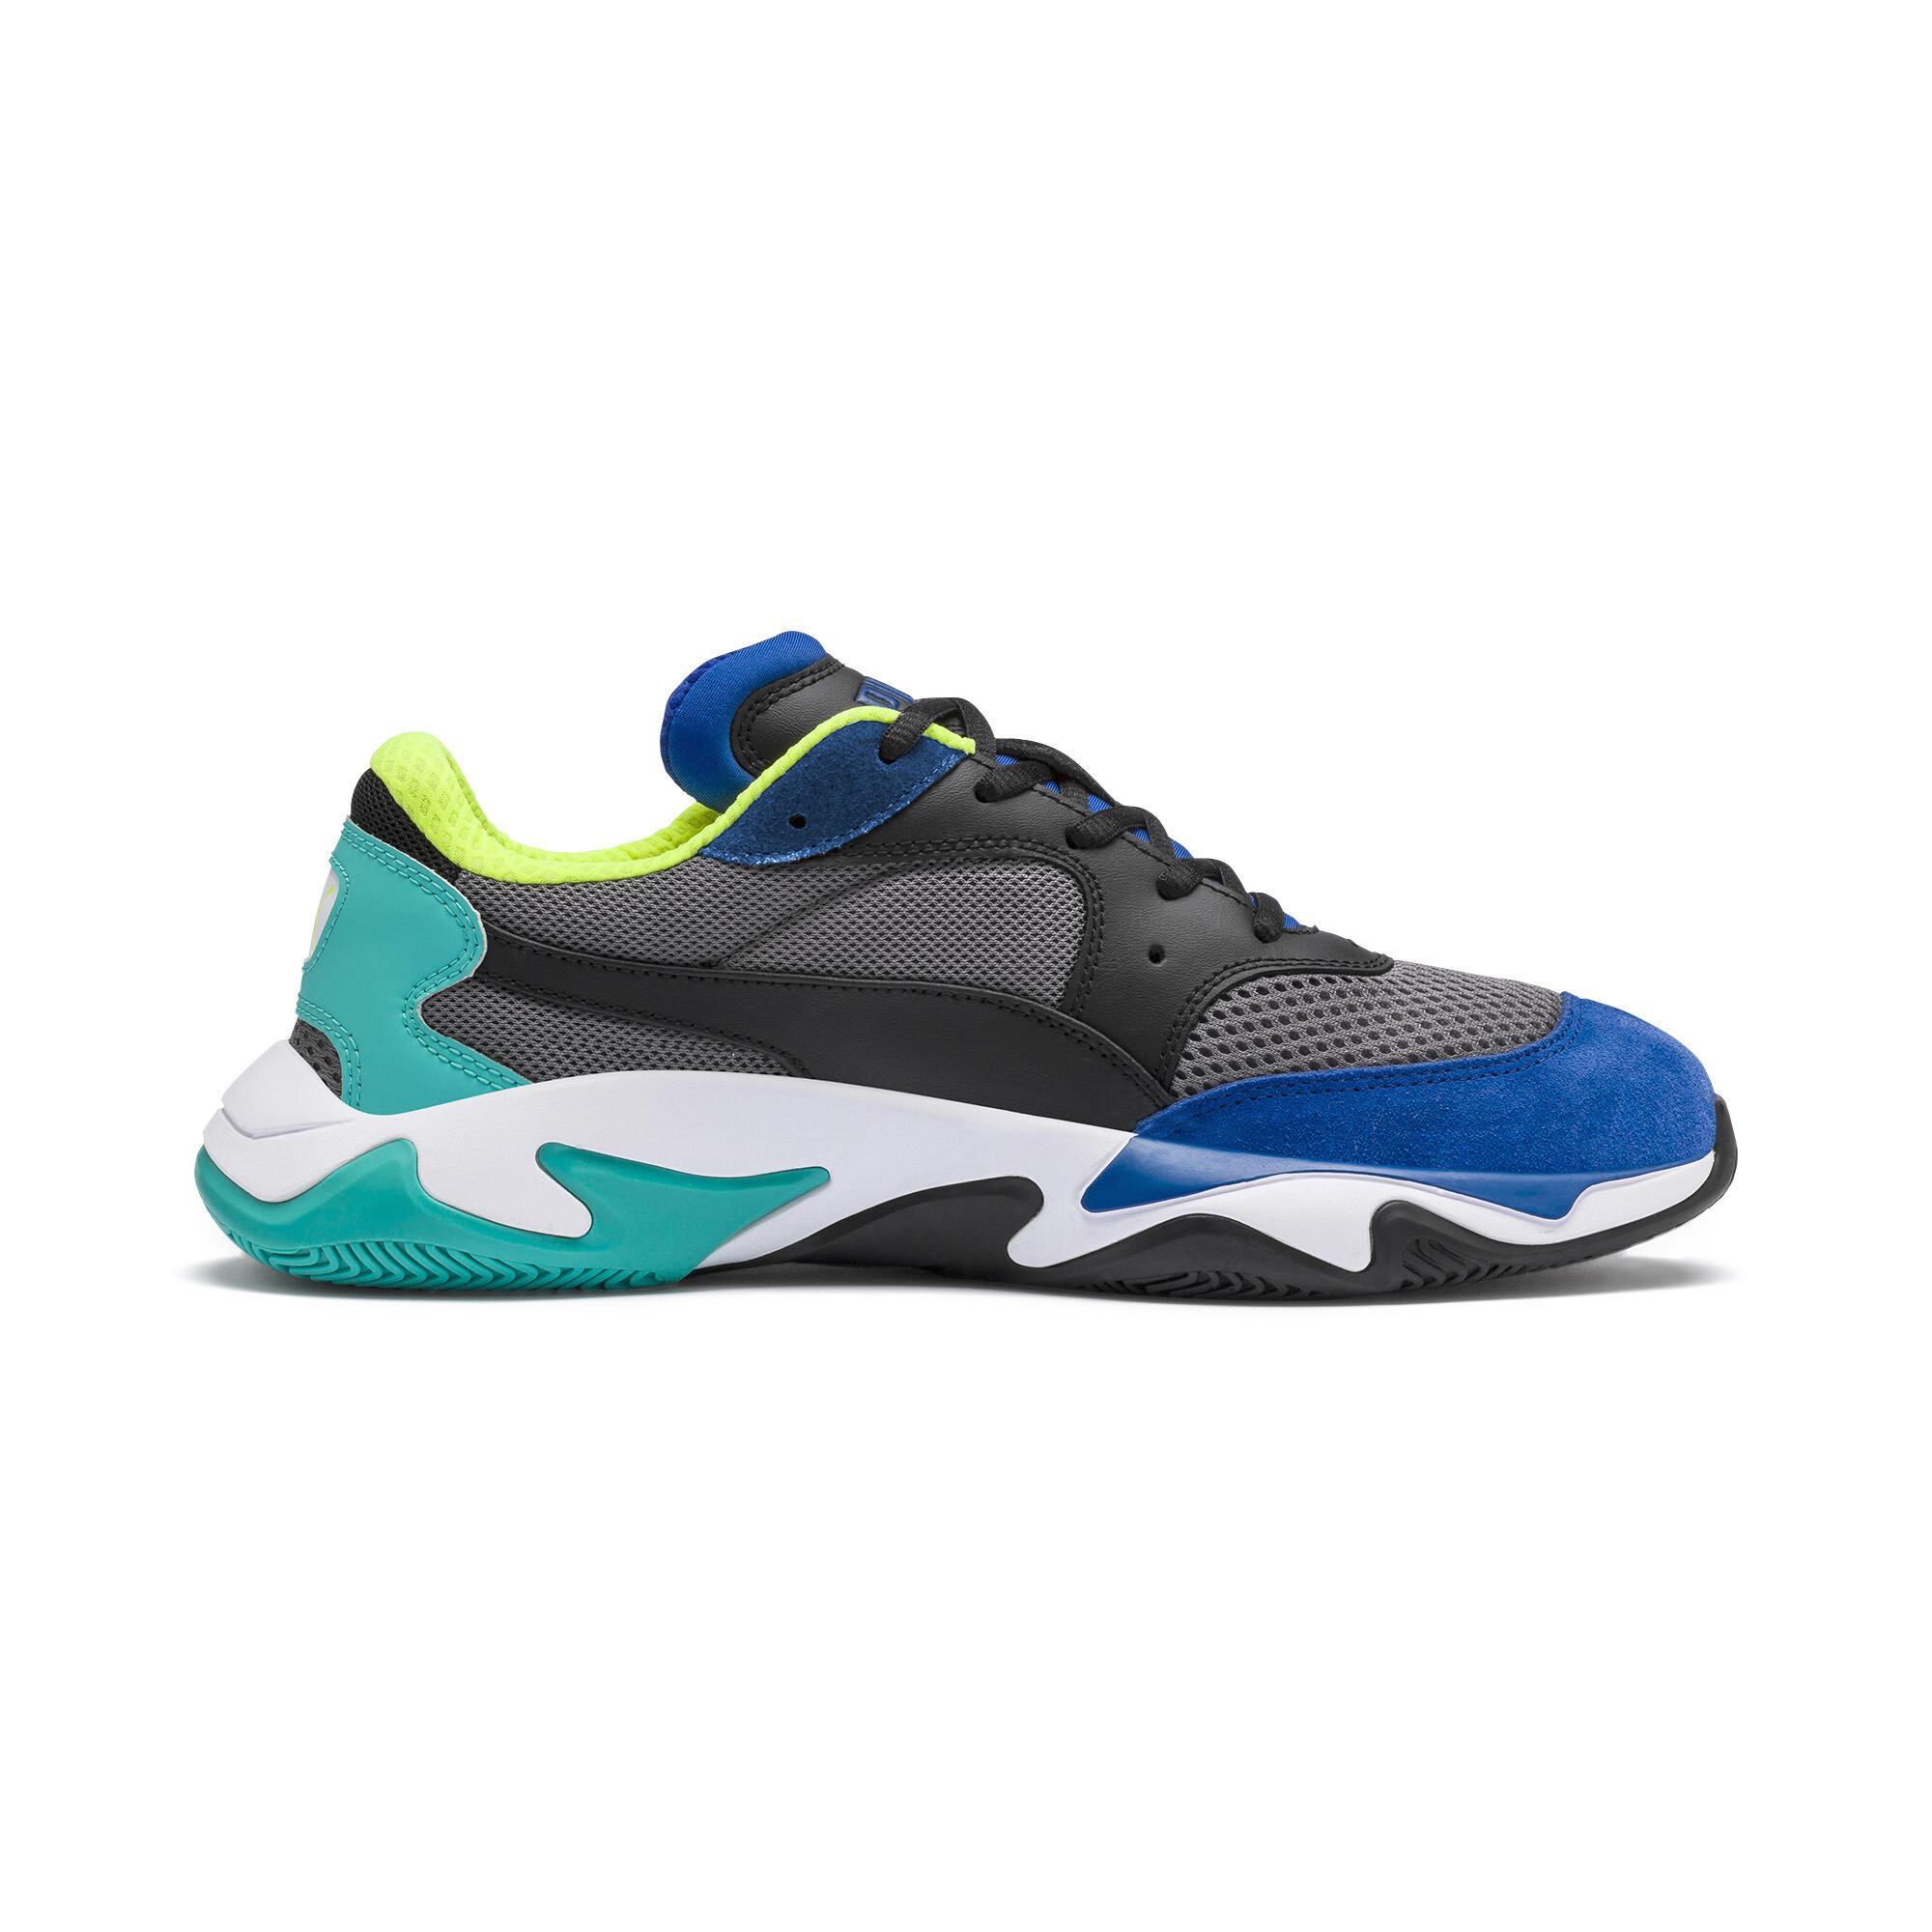 PUMA-Storm-Origin-Sneakers-Unisex-Shoe-Evolution thumbnail 14